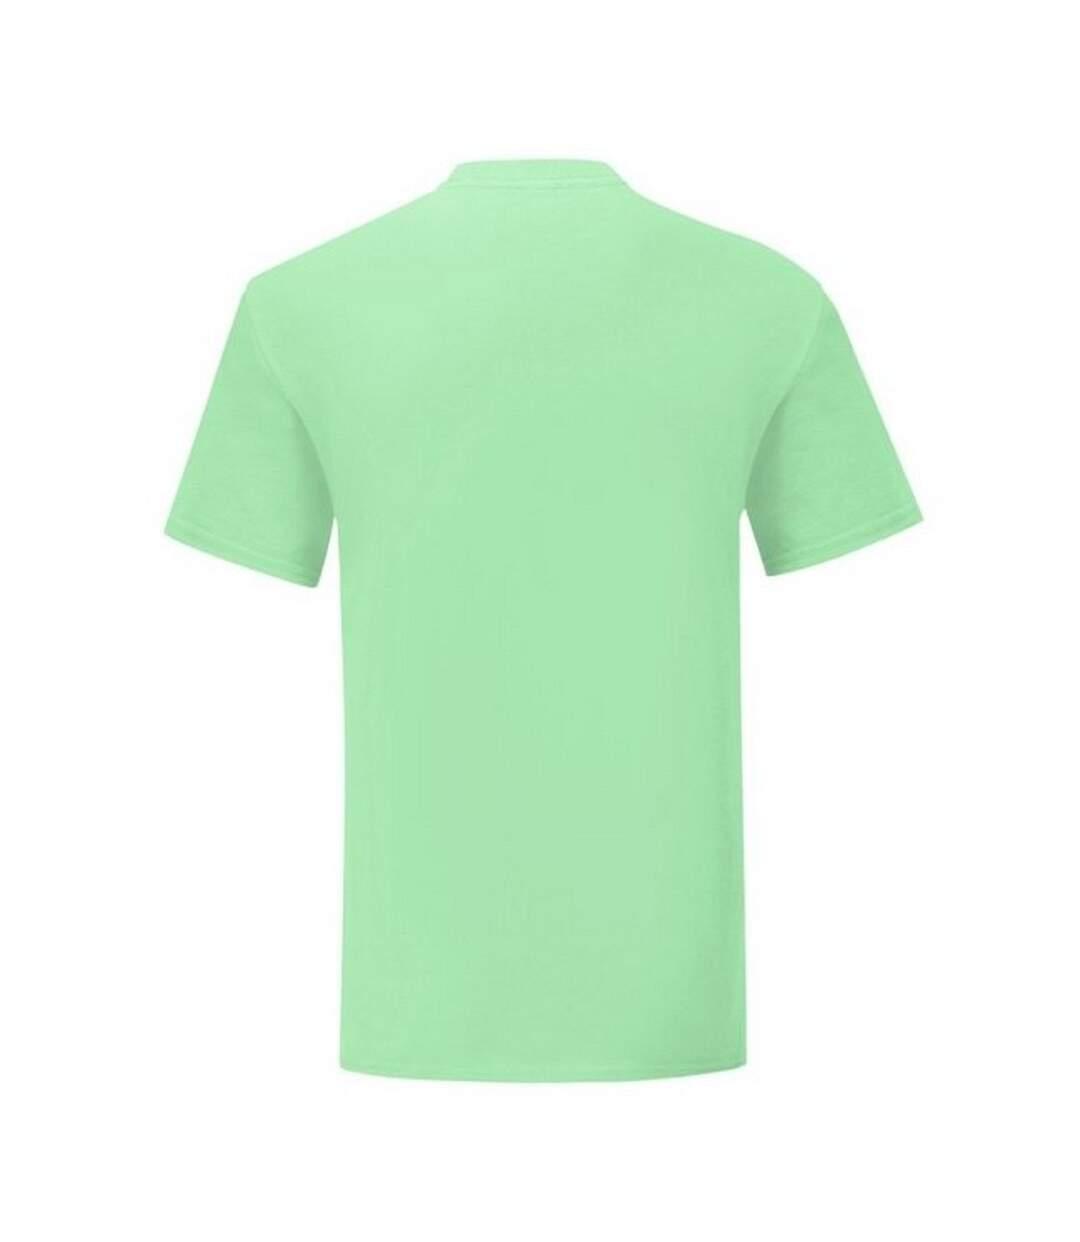 Fruit of the Loom Mens Iconic 150 T-Shirt (Mint Green) - UTBC4769